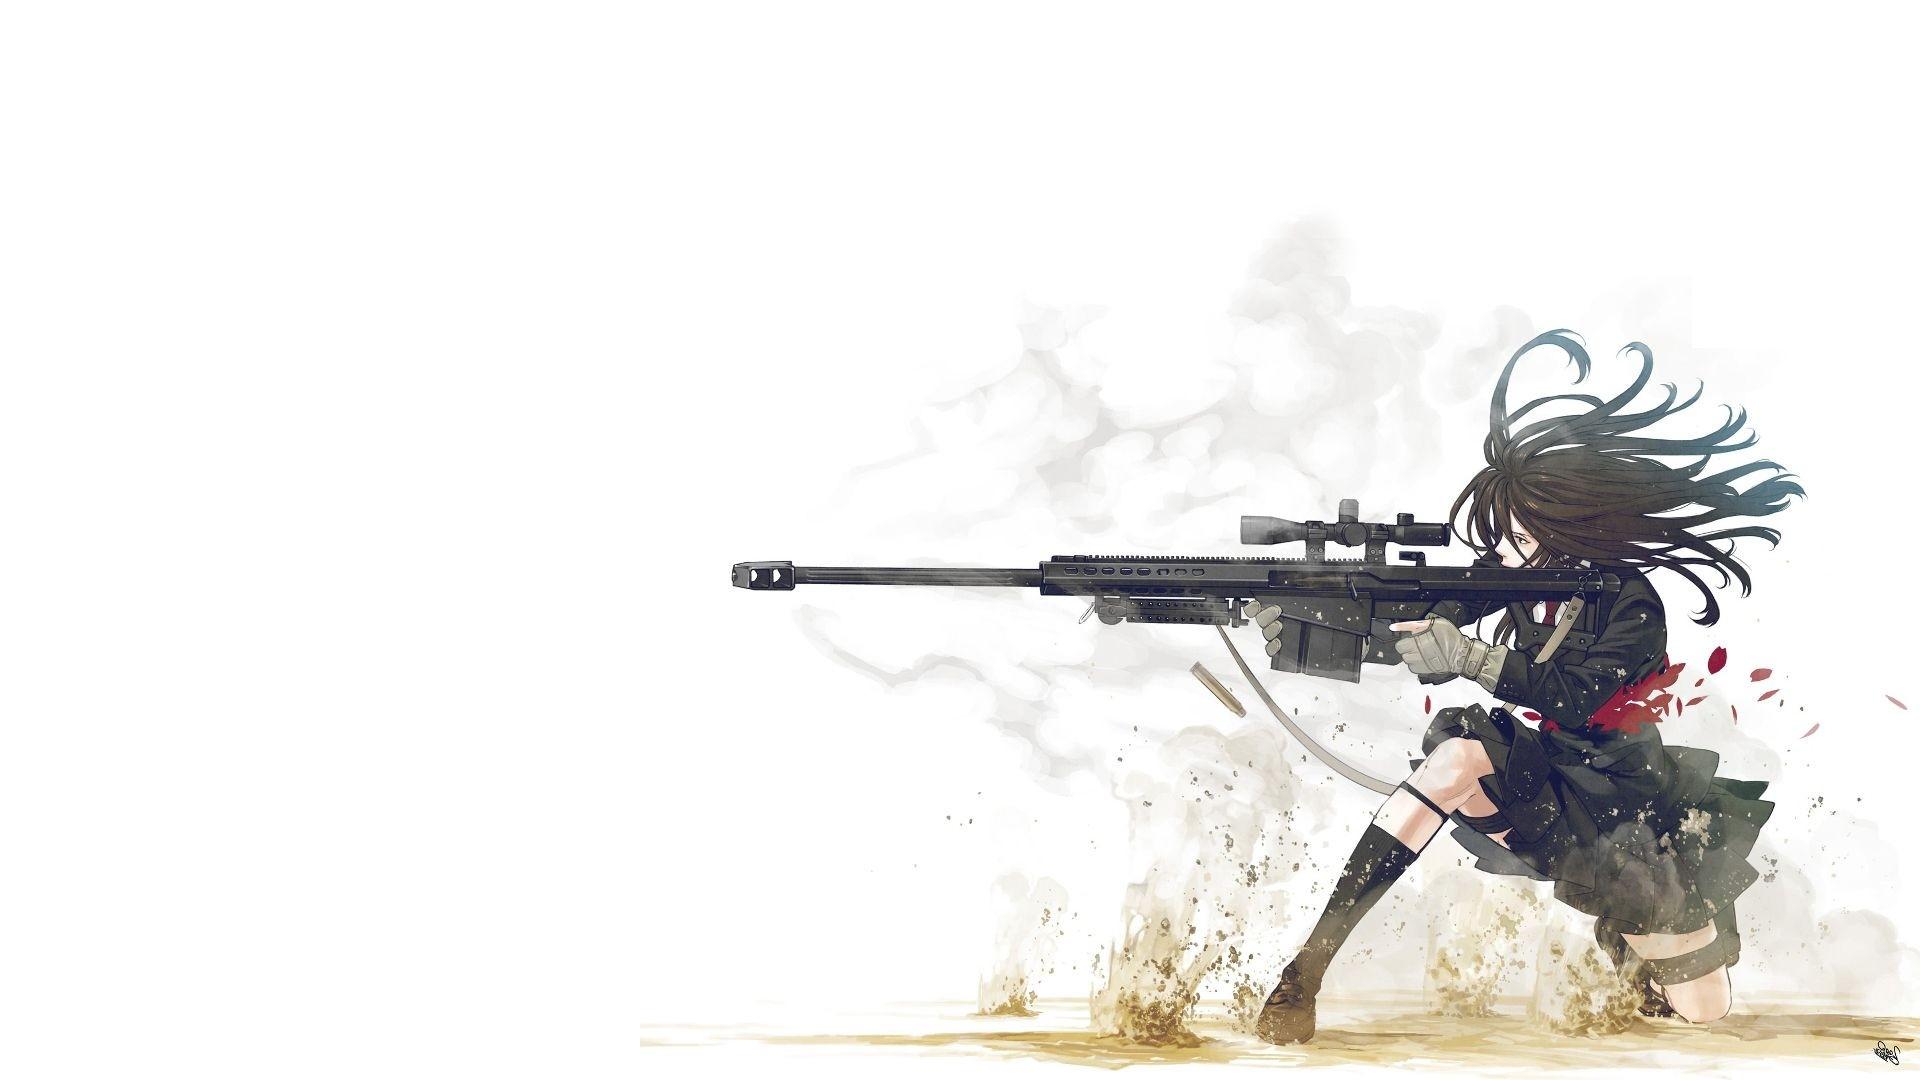 10x10, New Anime Girl Gun Wallpaper Free - Anime Girl With Gun